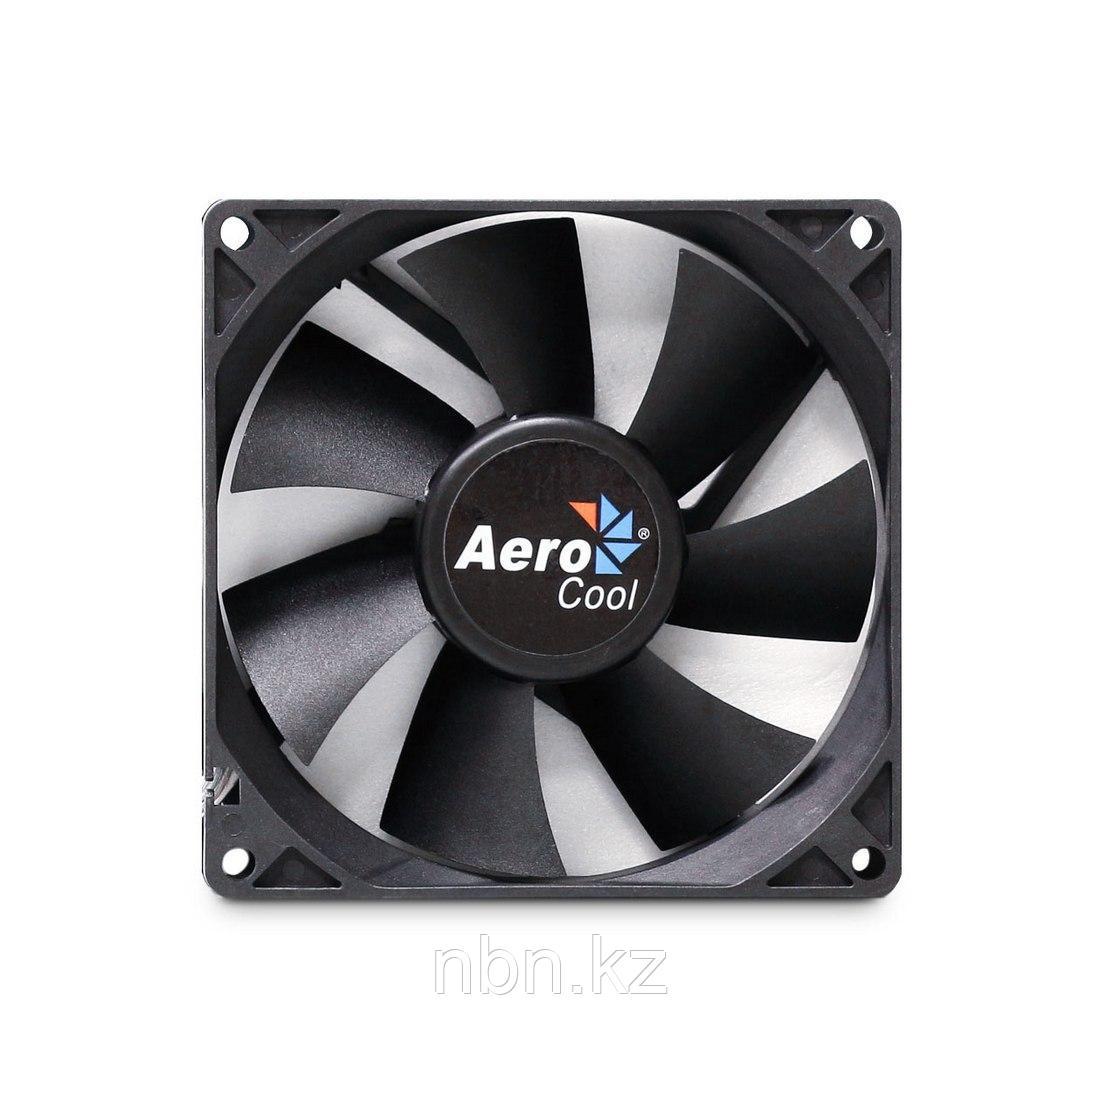 Кулер для компьютерного корпуса AeroCool  9см DARK FORCE Black